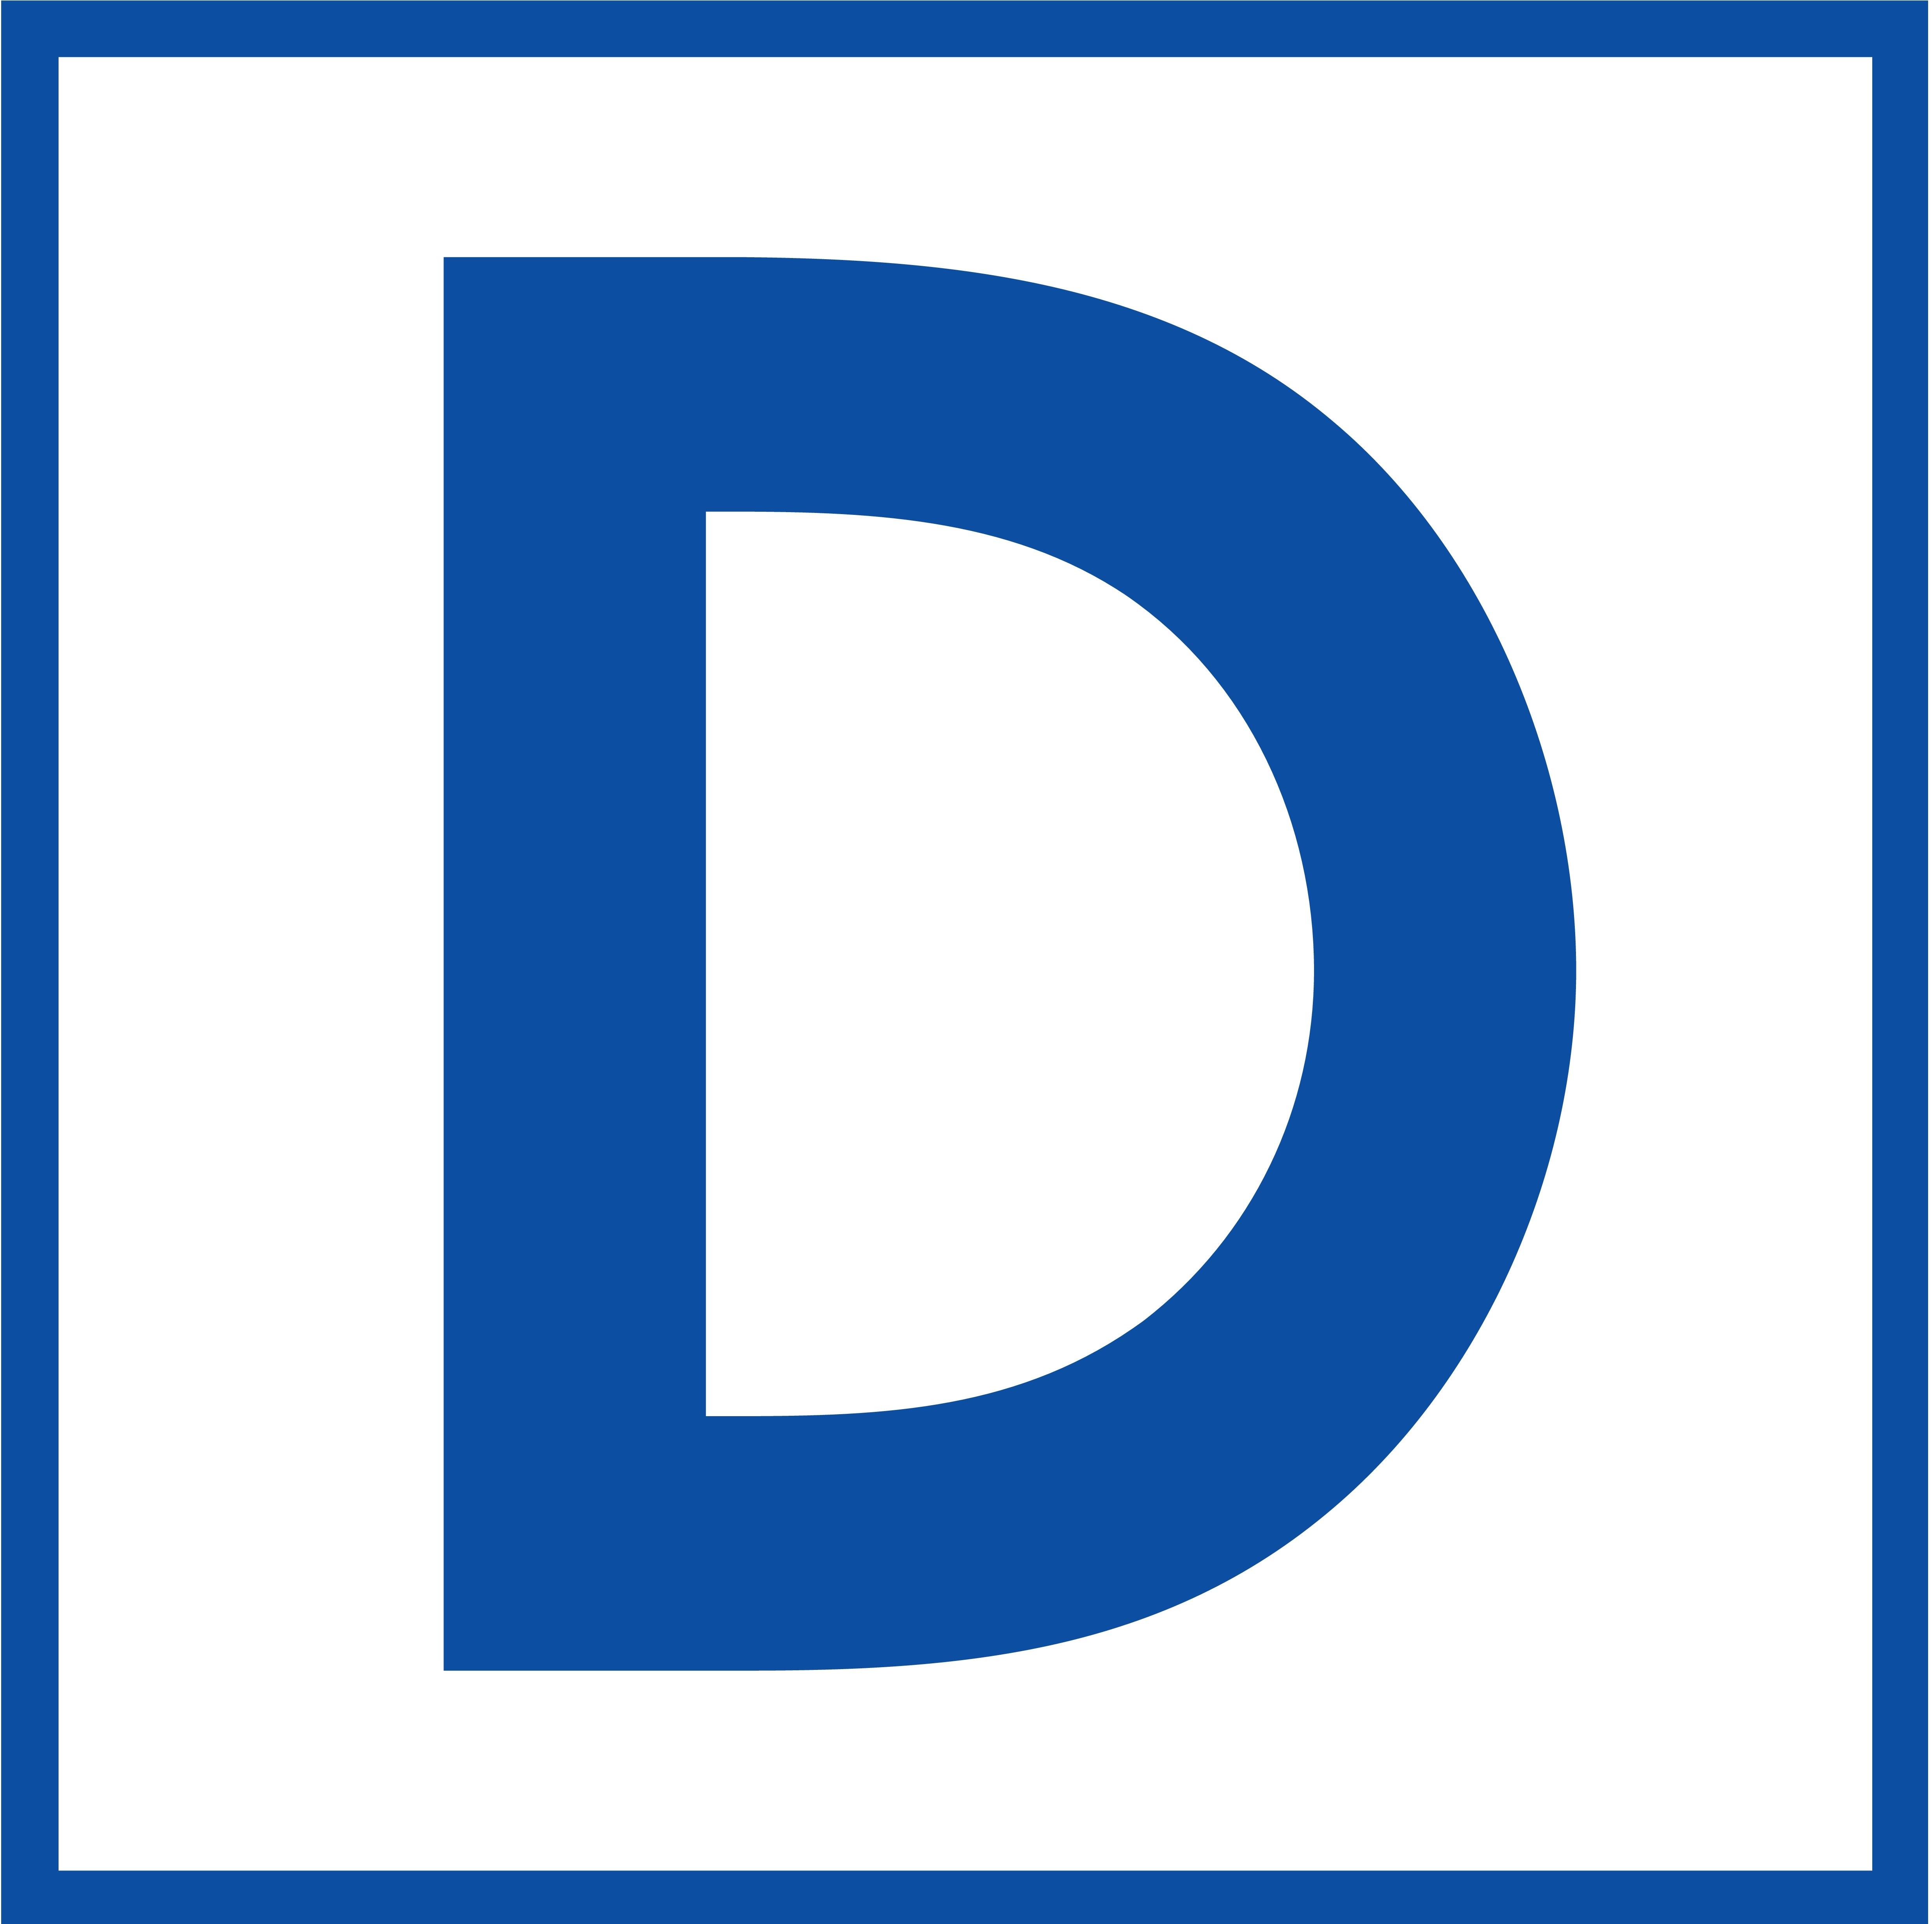 Daume_D_4c.jpg